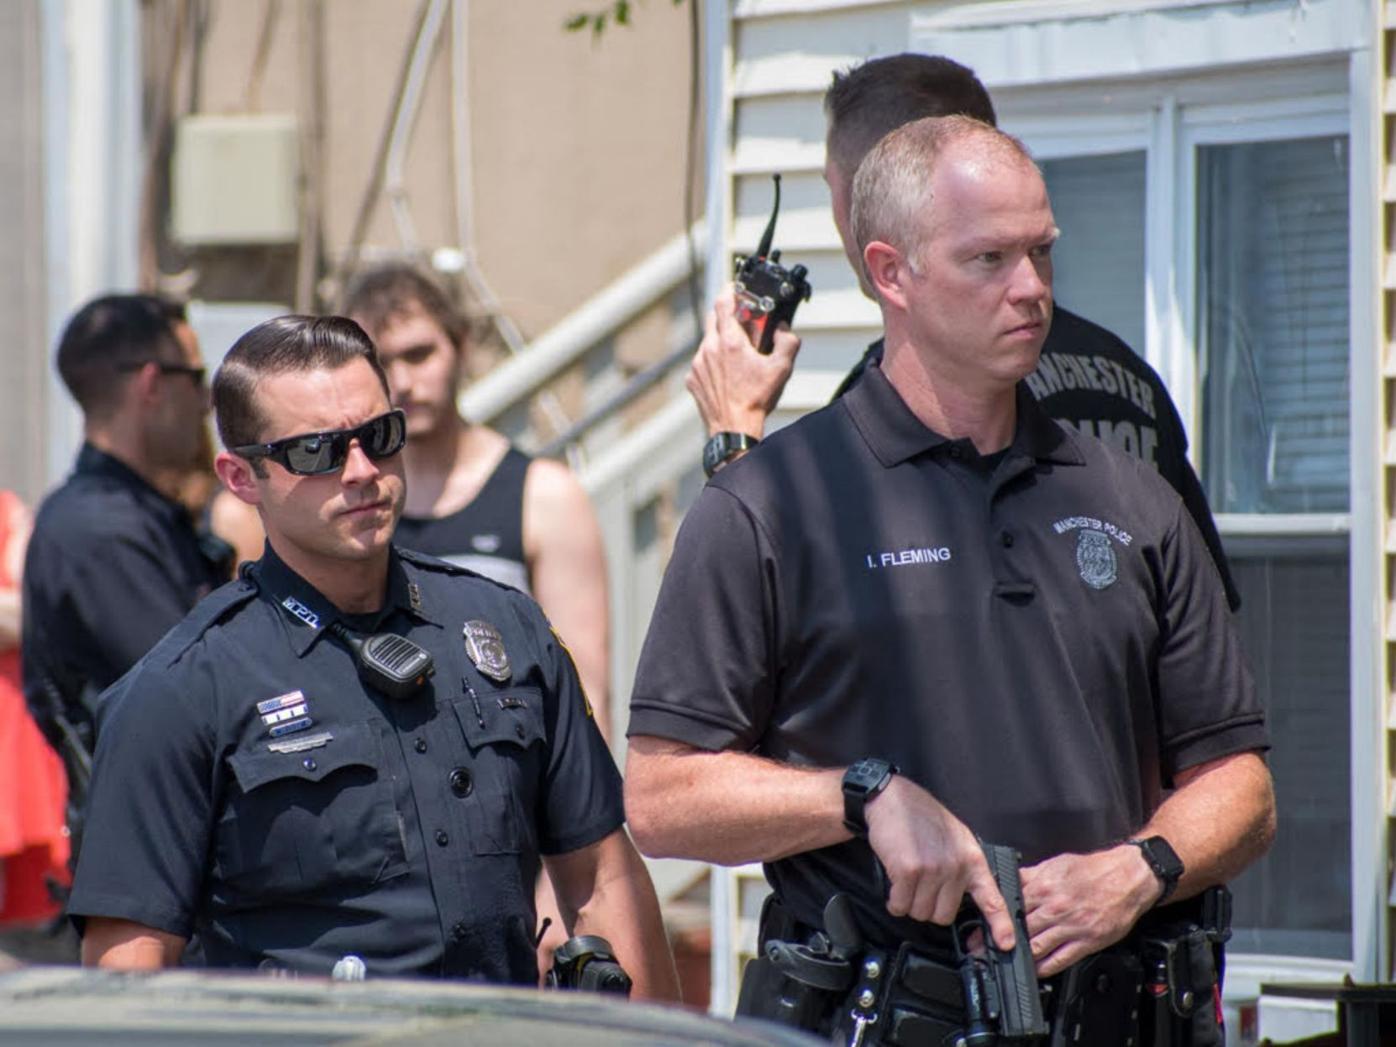 West Street investigation